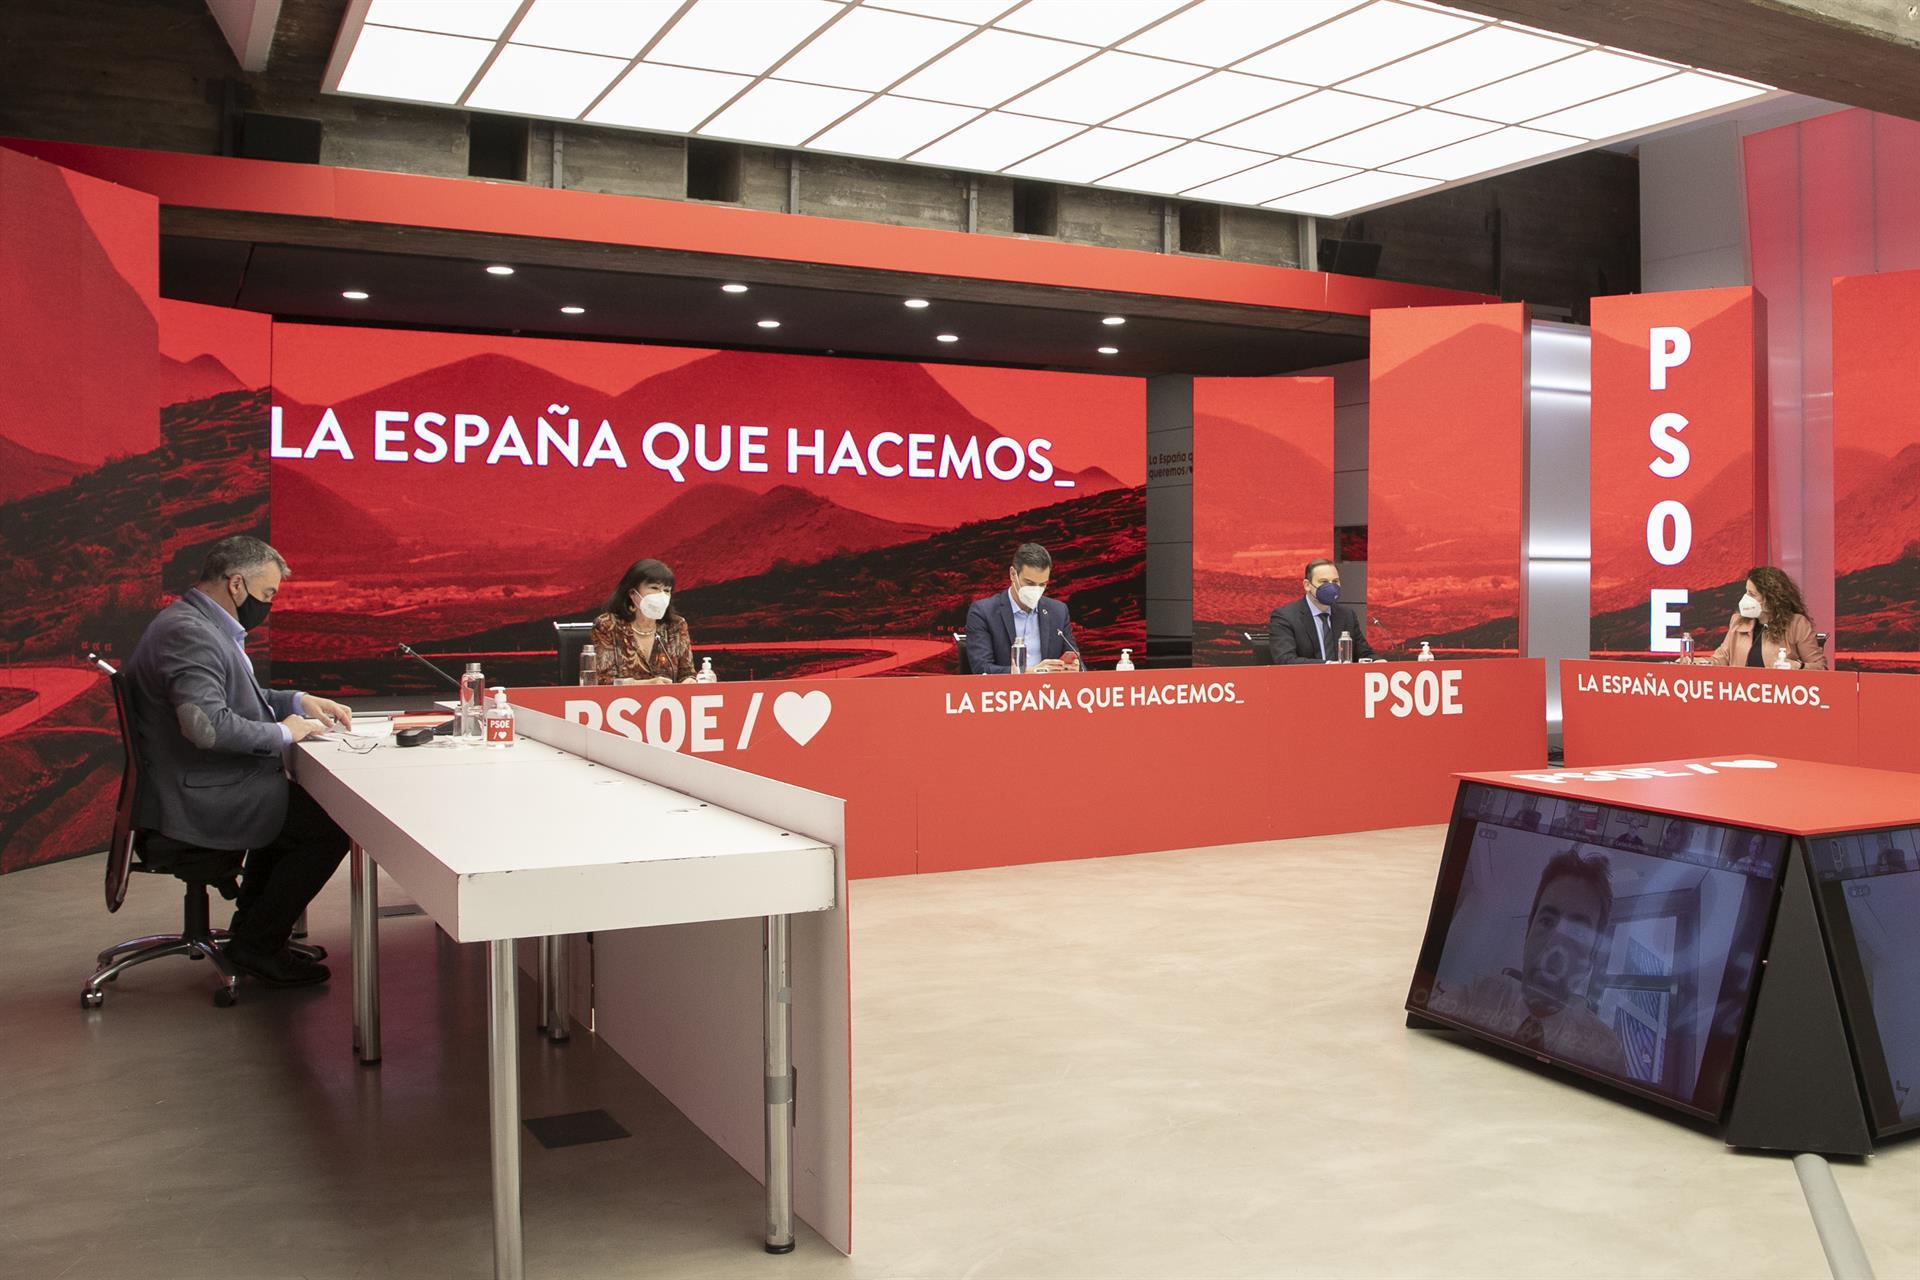 PSOE Santos Cerdán, Cristina Narbona, Pedro Sánchez, José Luis Ábalos